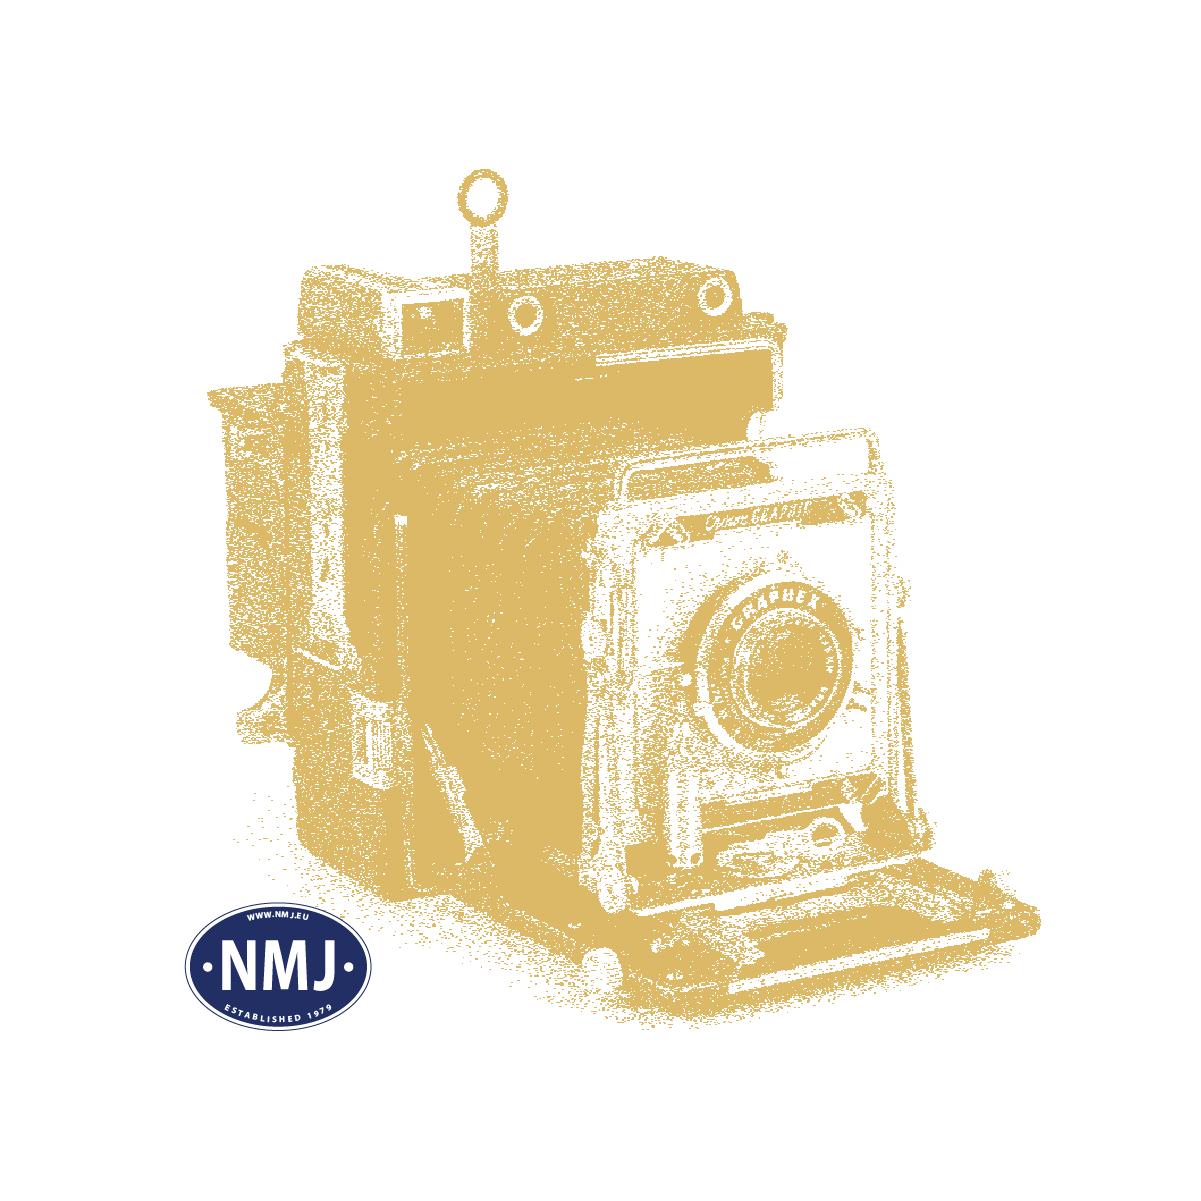 NMJT145003 - NMJ Topline NSB Di3.623, Redbrown Livery, 0-Scale